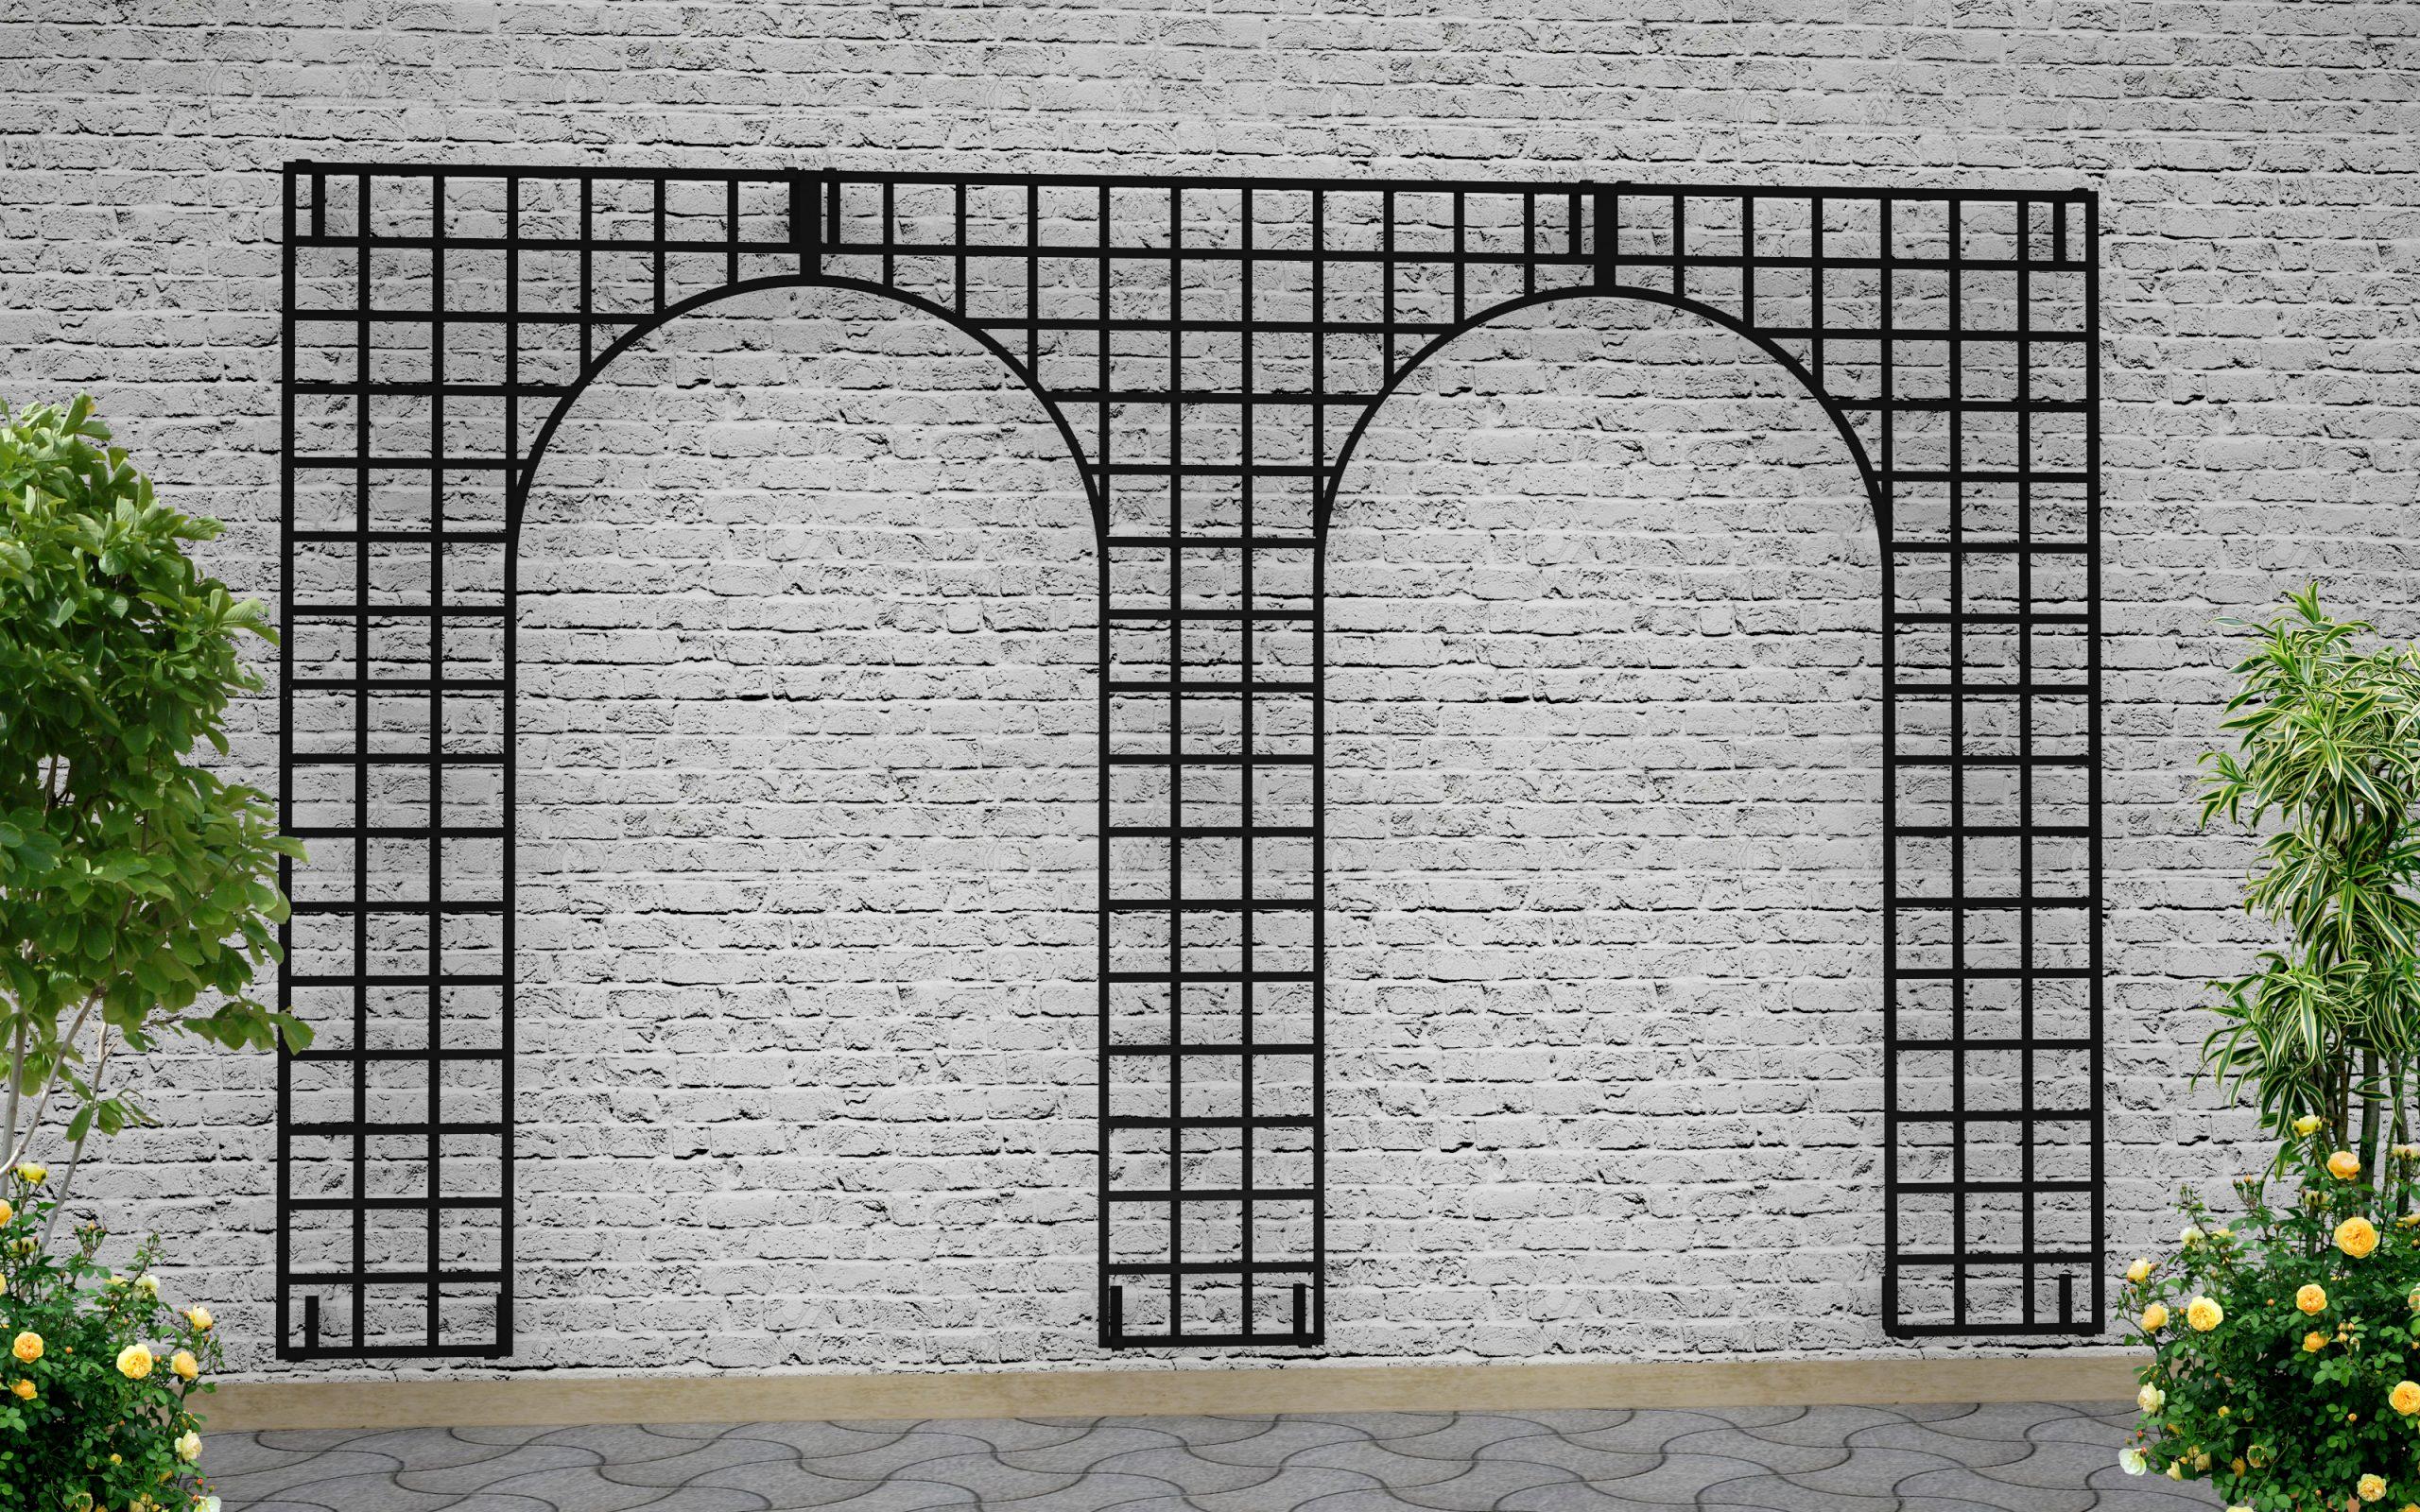 Eastnor Castle - Doppel Bogen Metall Wandgitter an moderner Fassade